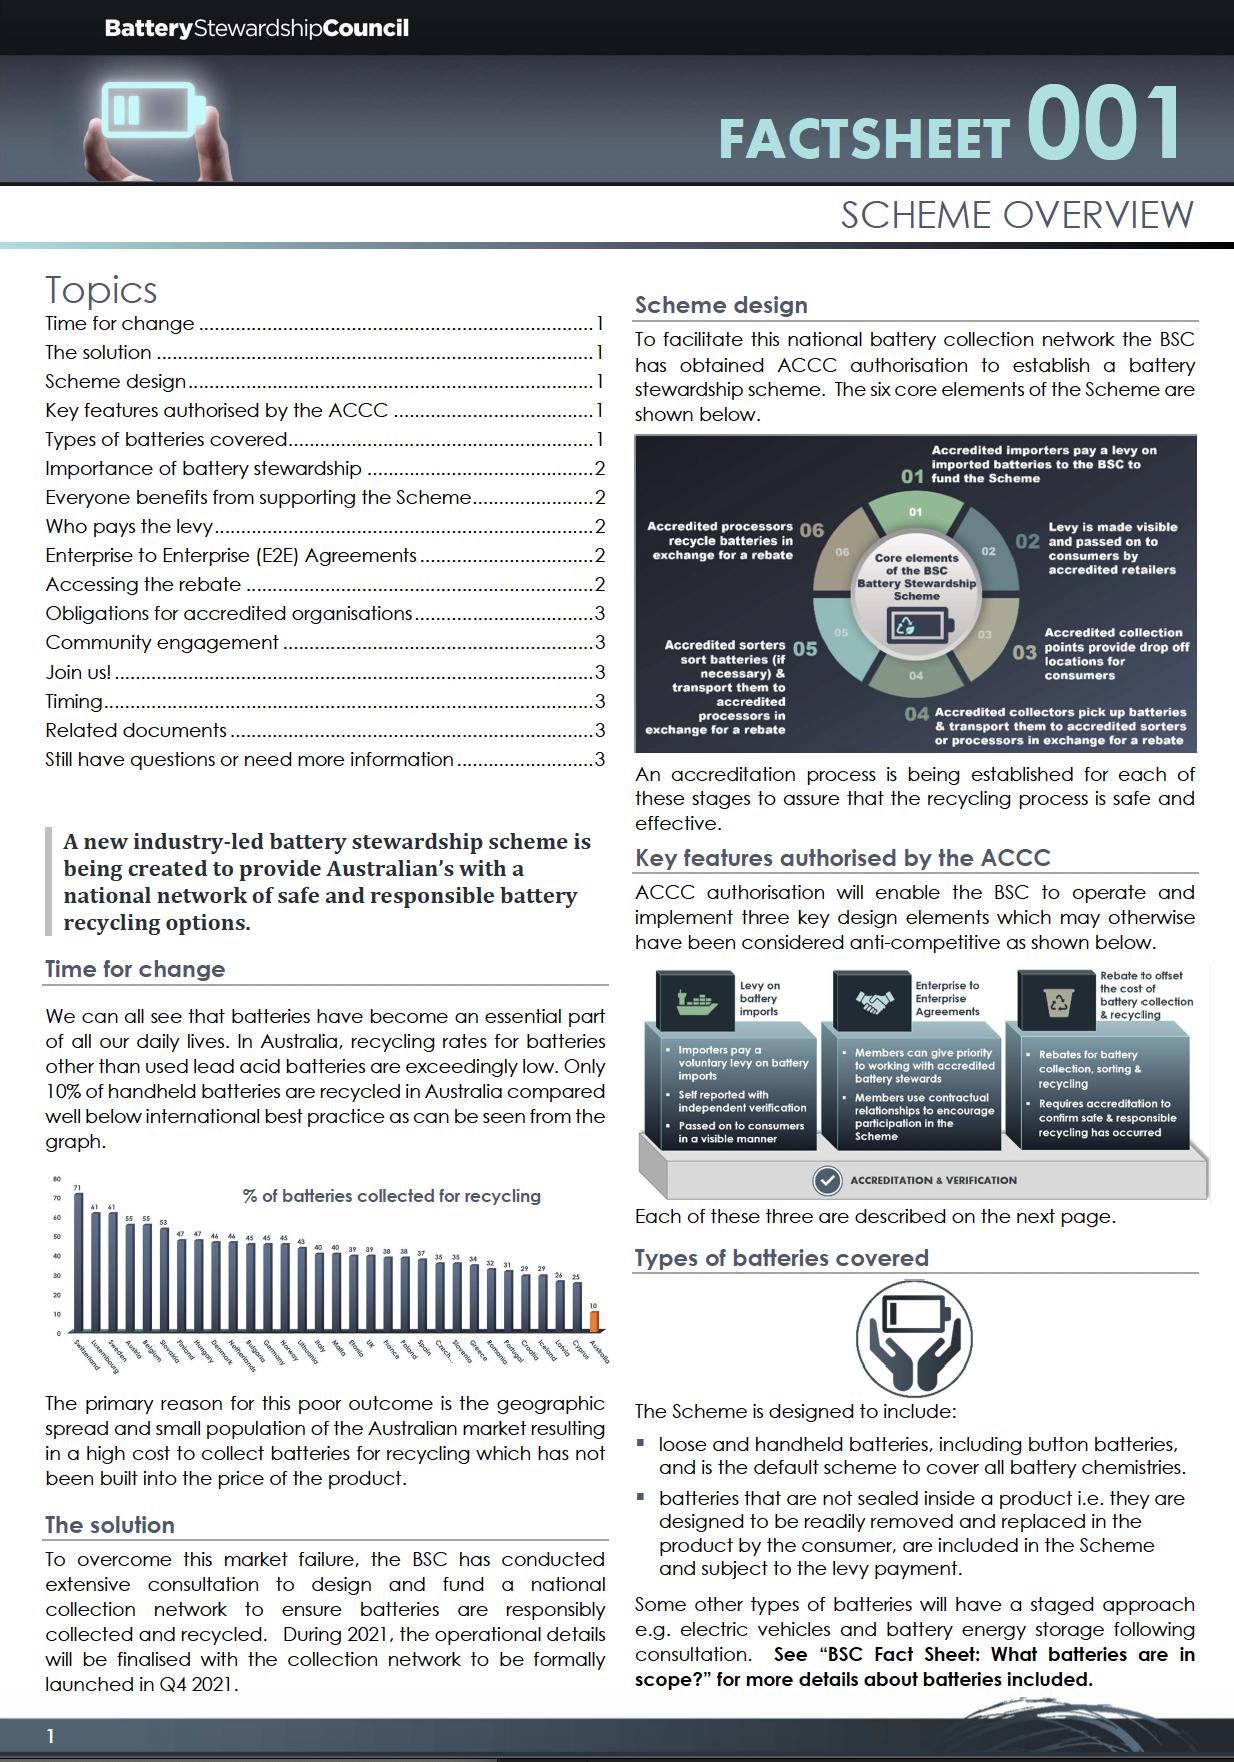 BSC FACTSHEET 001: Scheme Overview